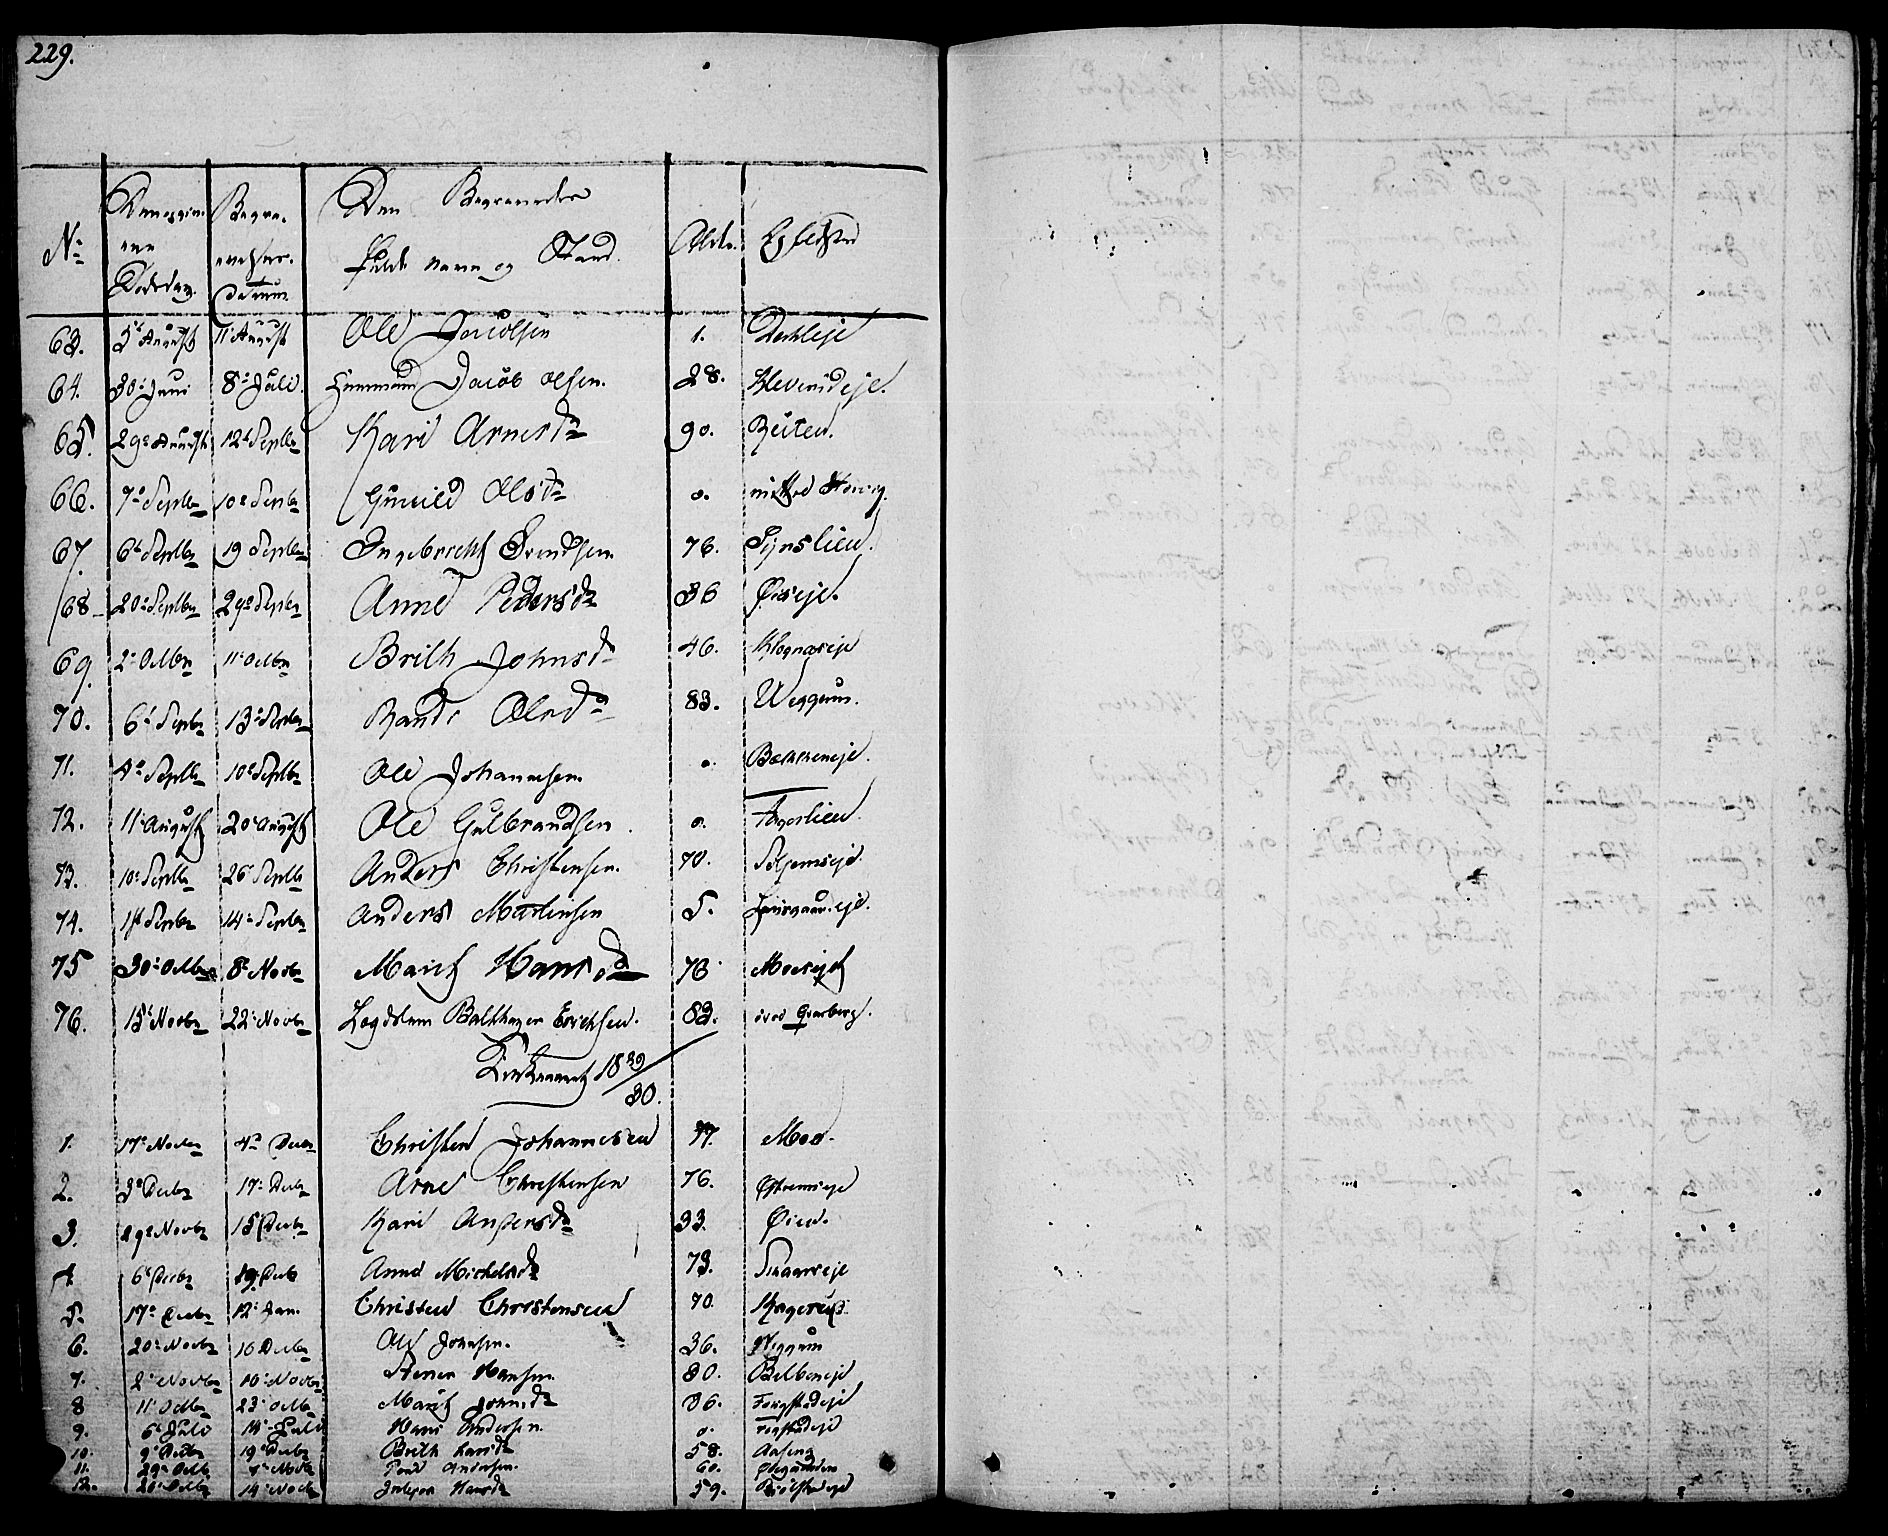 SAH, Vågå prestekontor, Ministerialbok nr. 4 /1, 1827-1842, s. 229